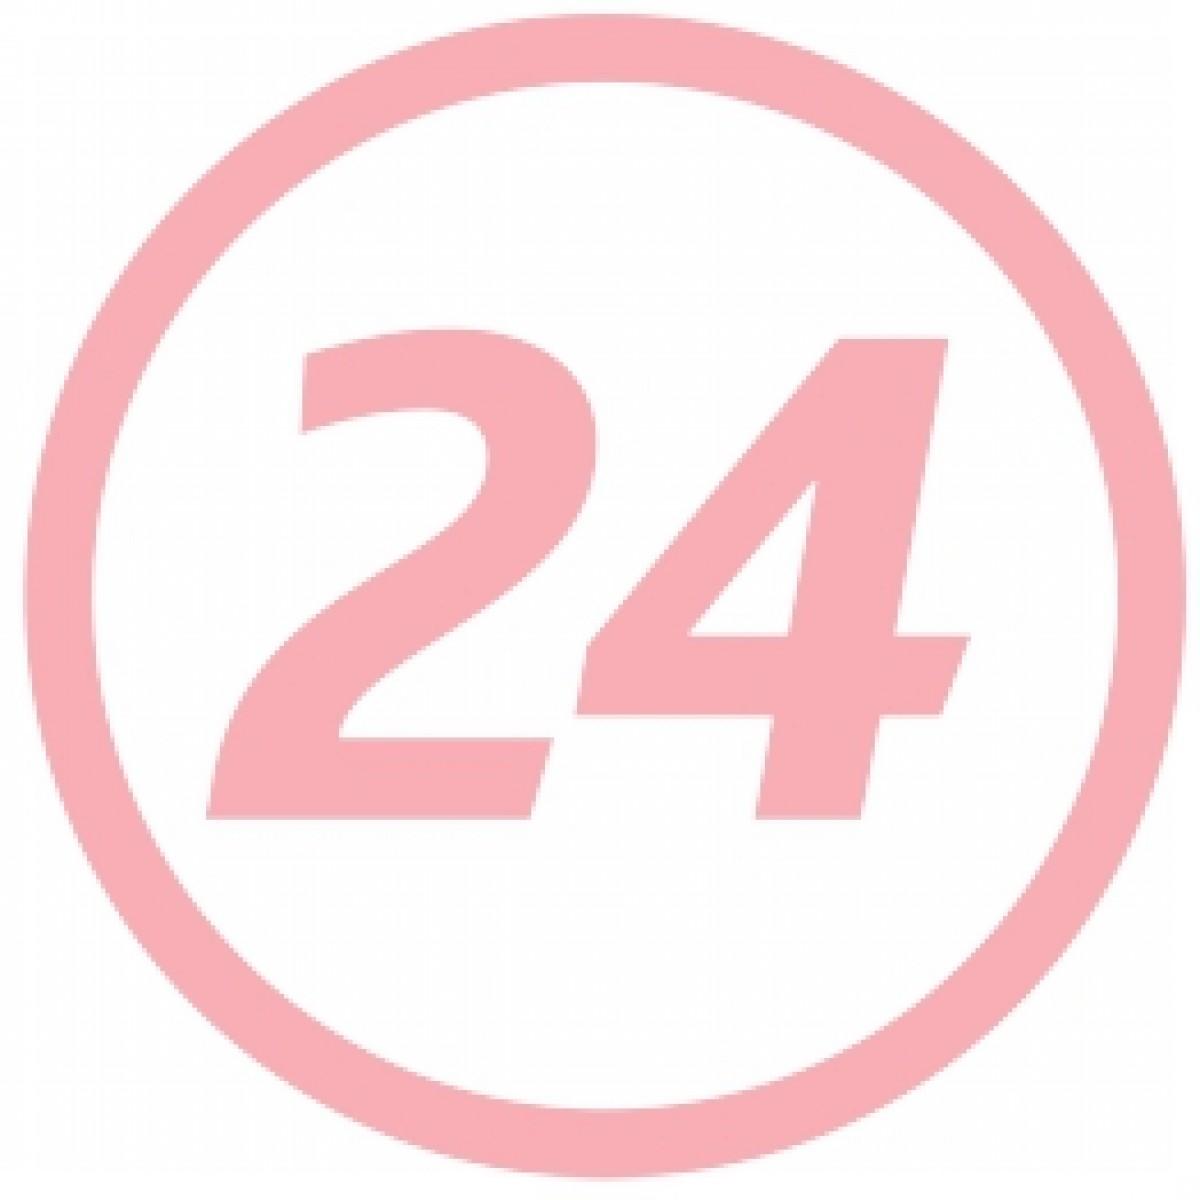 Balansoar muzical 2 in 1 cu vibratii Baby Mix 212 039 Green